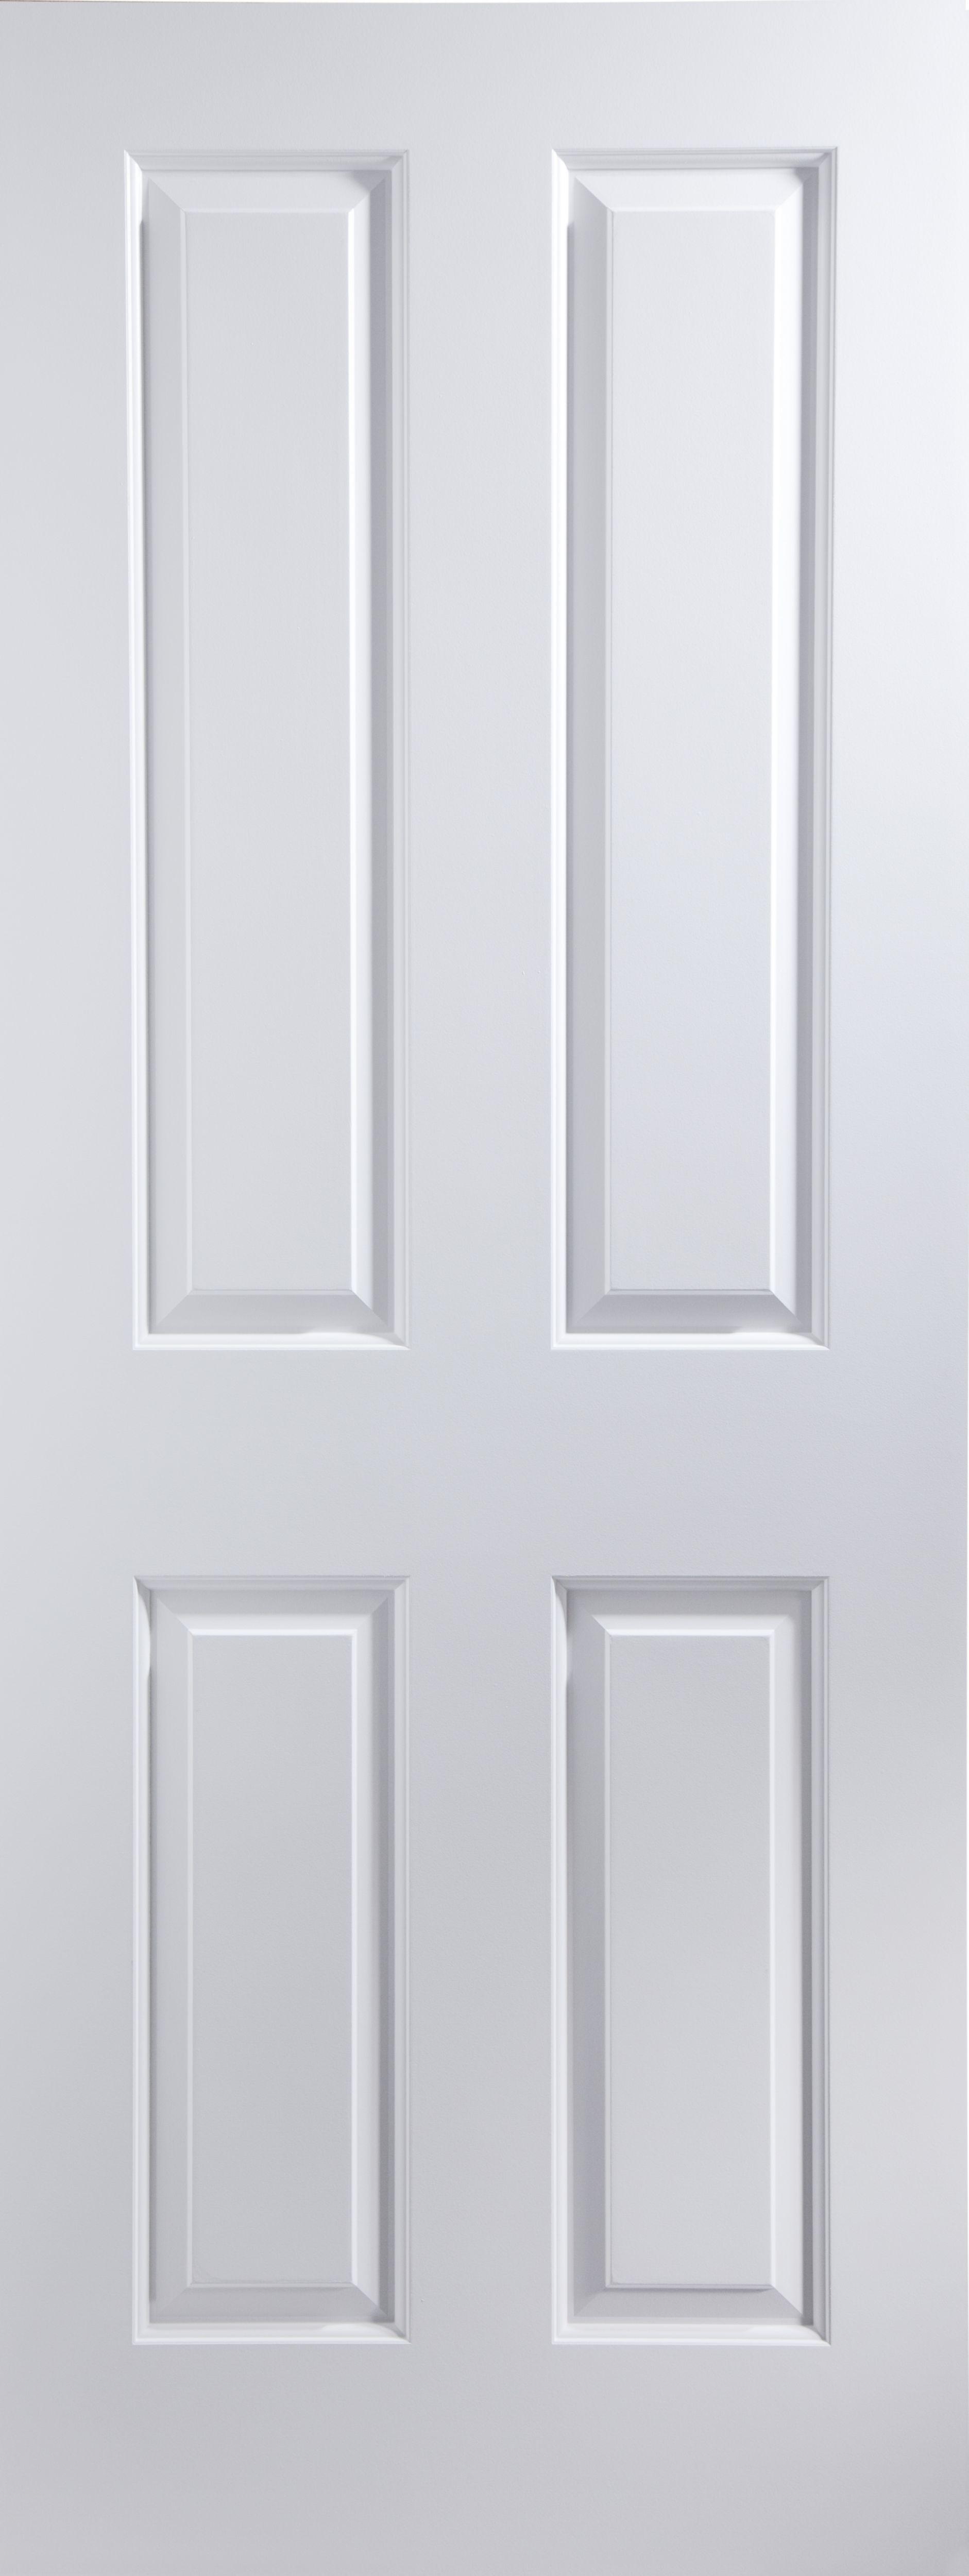 4 panel pre painted white woodgrain internal unglazed door. Black Bedroom Furniture Sets. Home Design Ideas